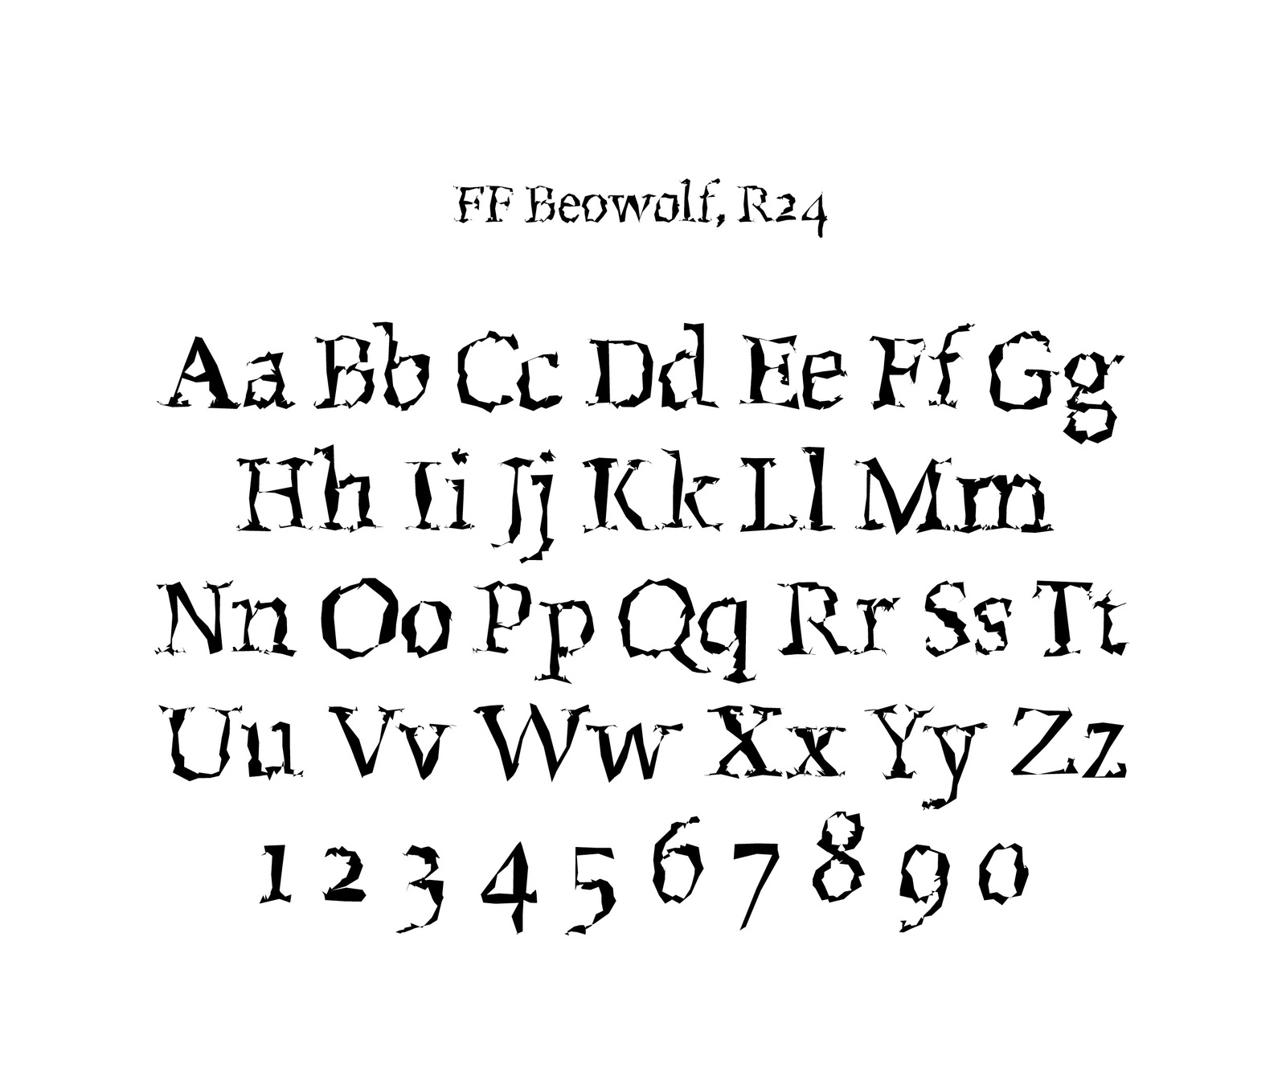 FF Beowolf 1990 image